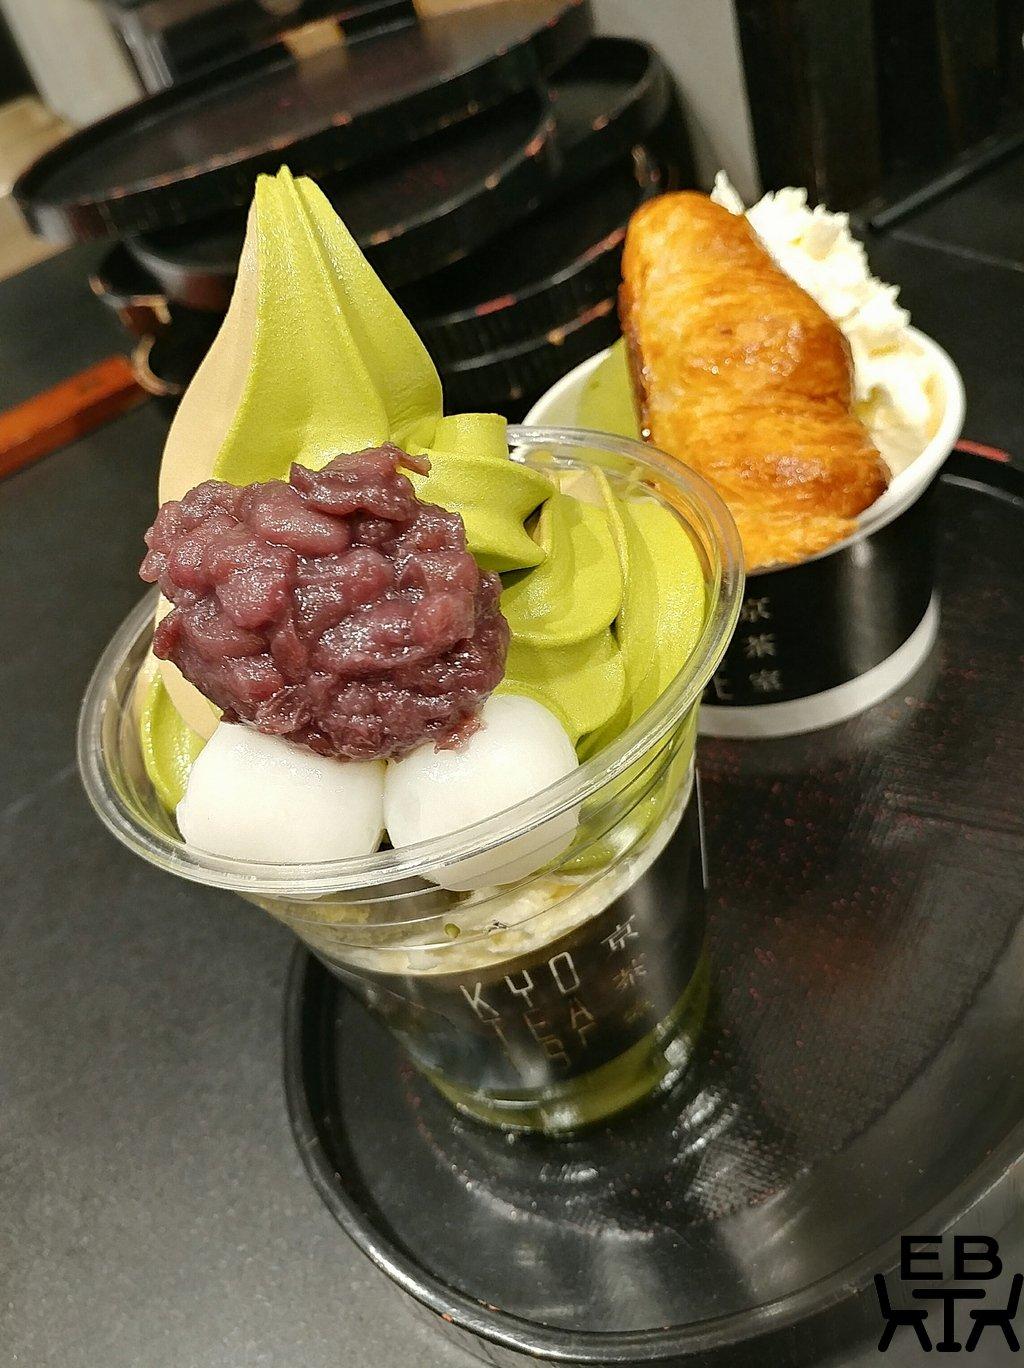 kyo tea house desserts